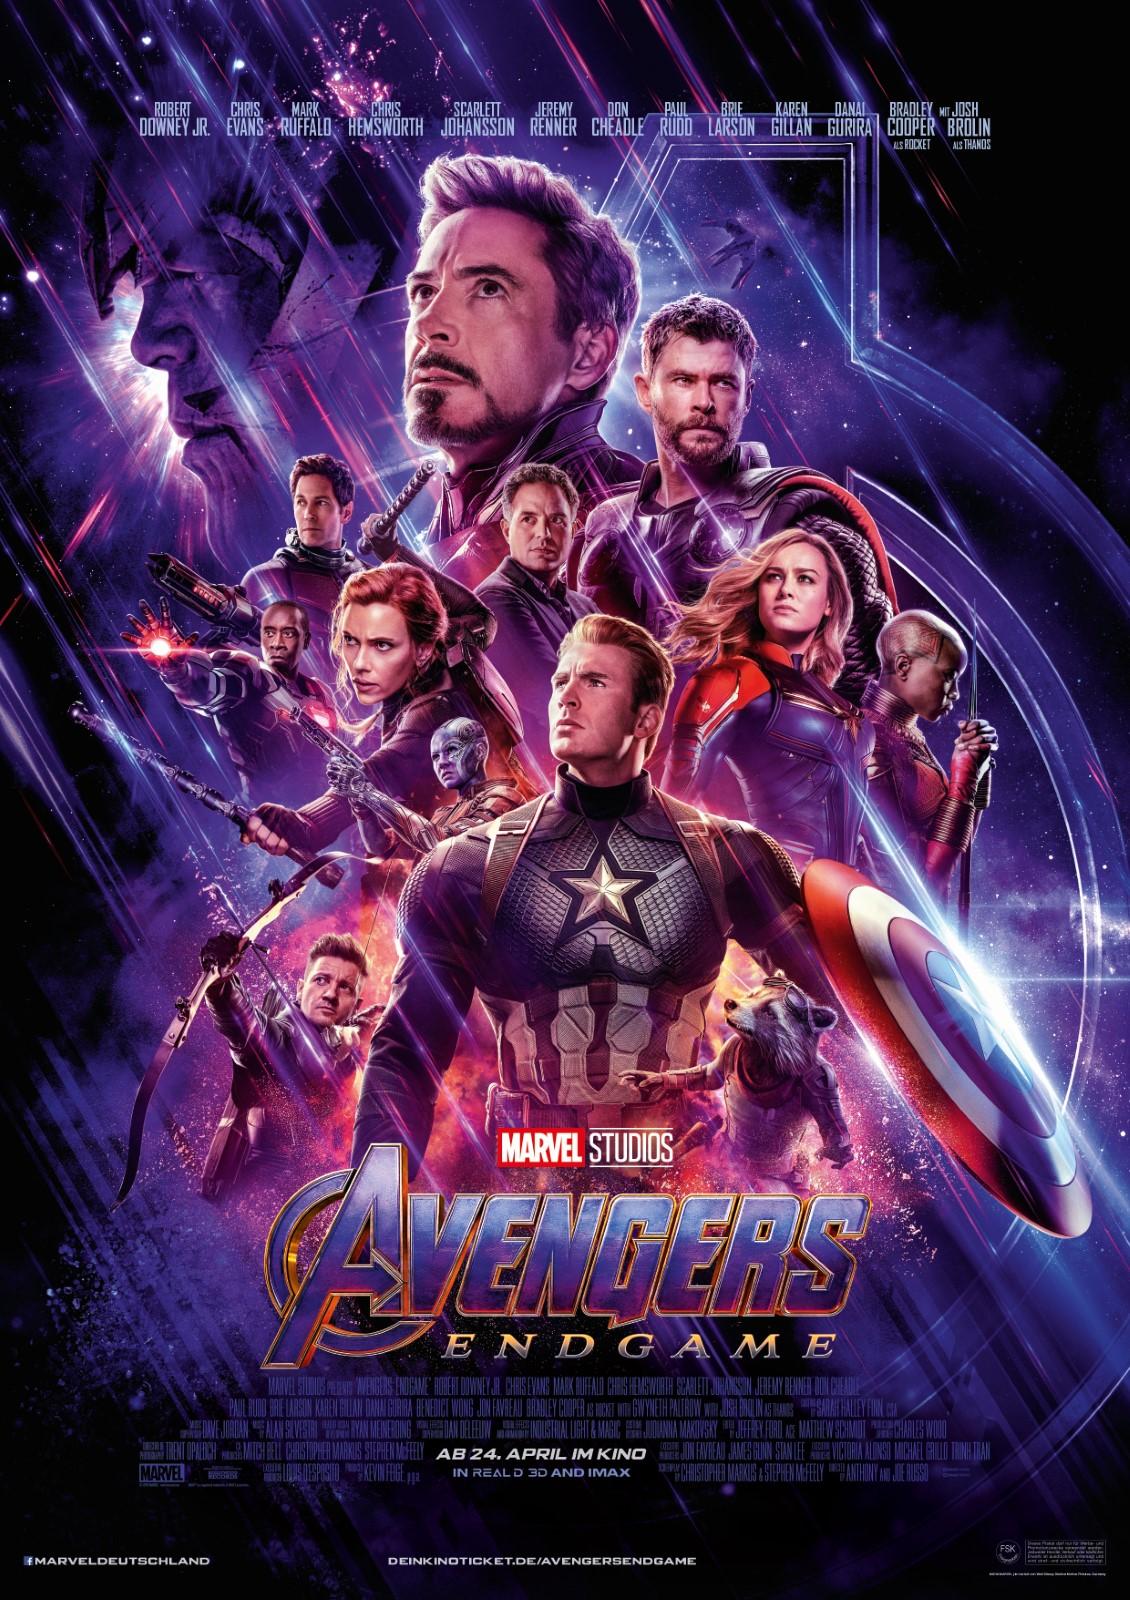 Avengers Endgame Einspielergebnis